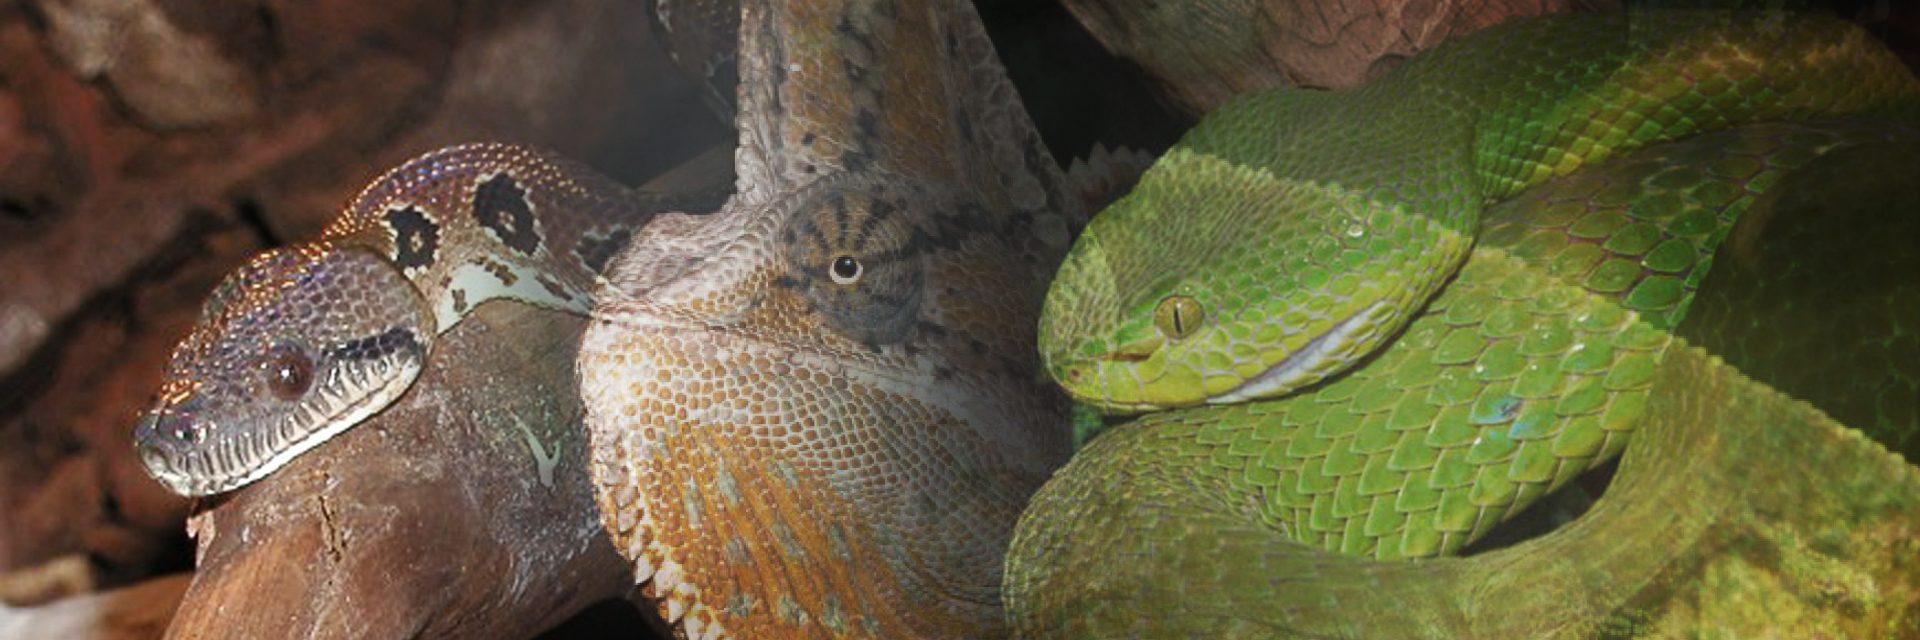 reptiles-1920x640